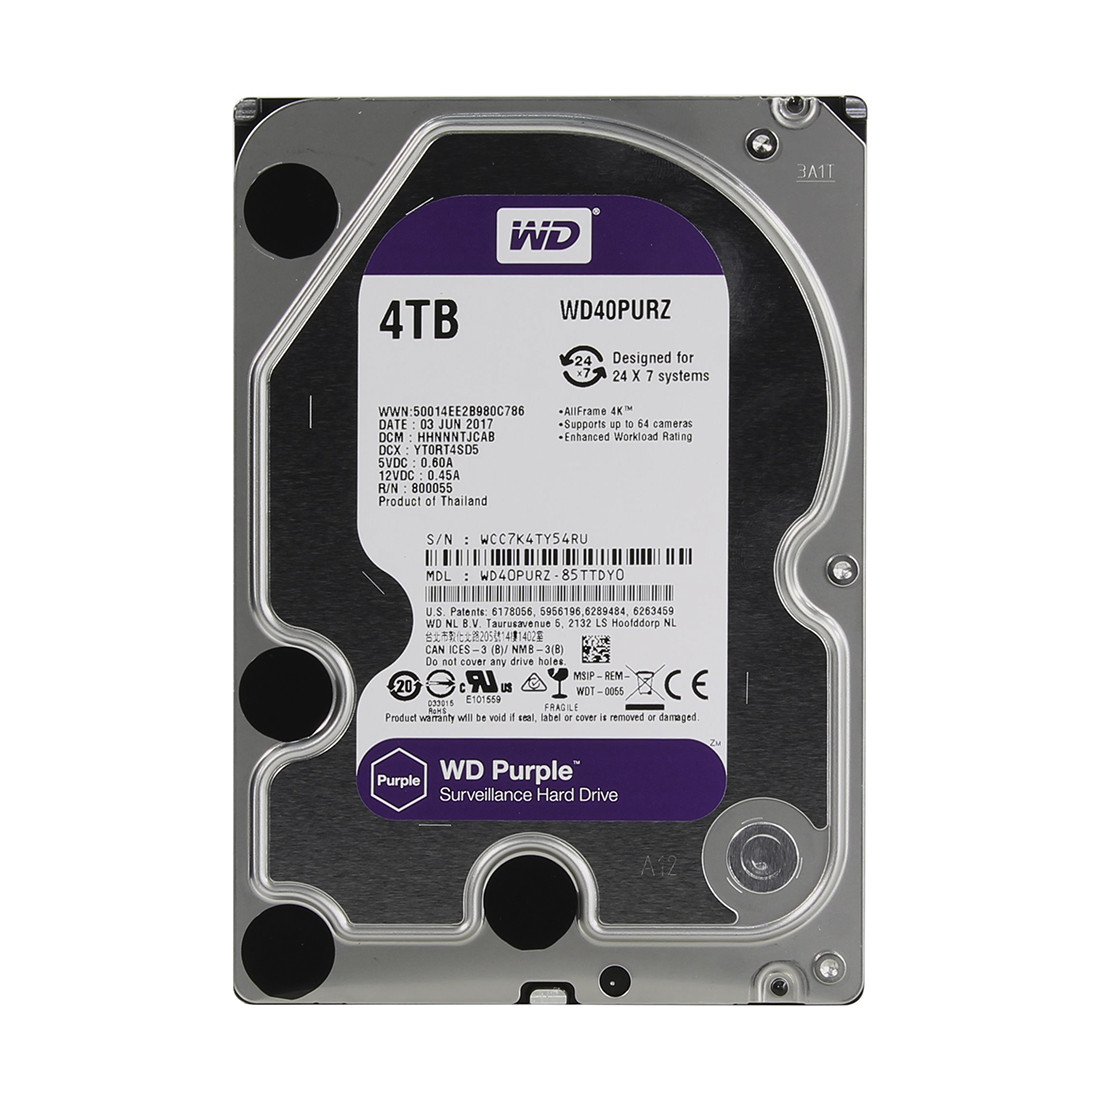 Жёсткий диск для видеонаблюдения, Western Digital, WD40PURZ Purple, HDD 4Tb, SATA 6Gb/s 64Mb 3,5